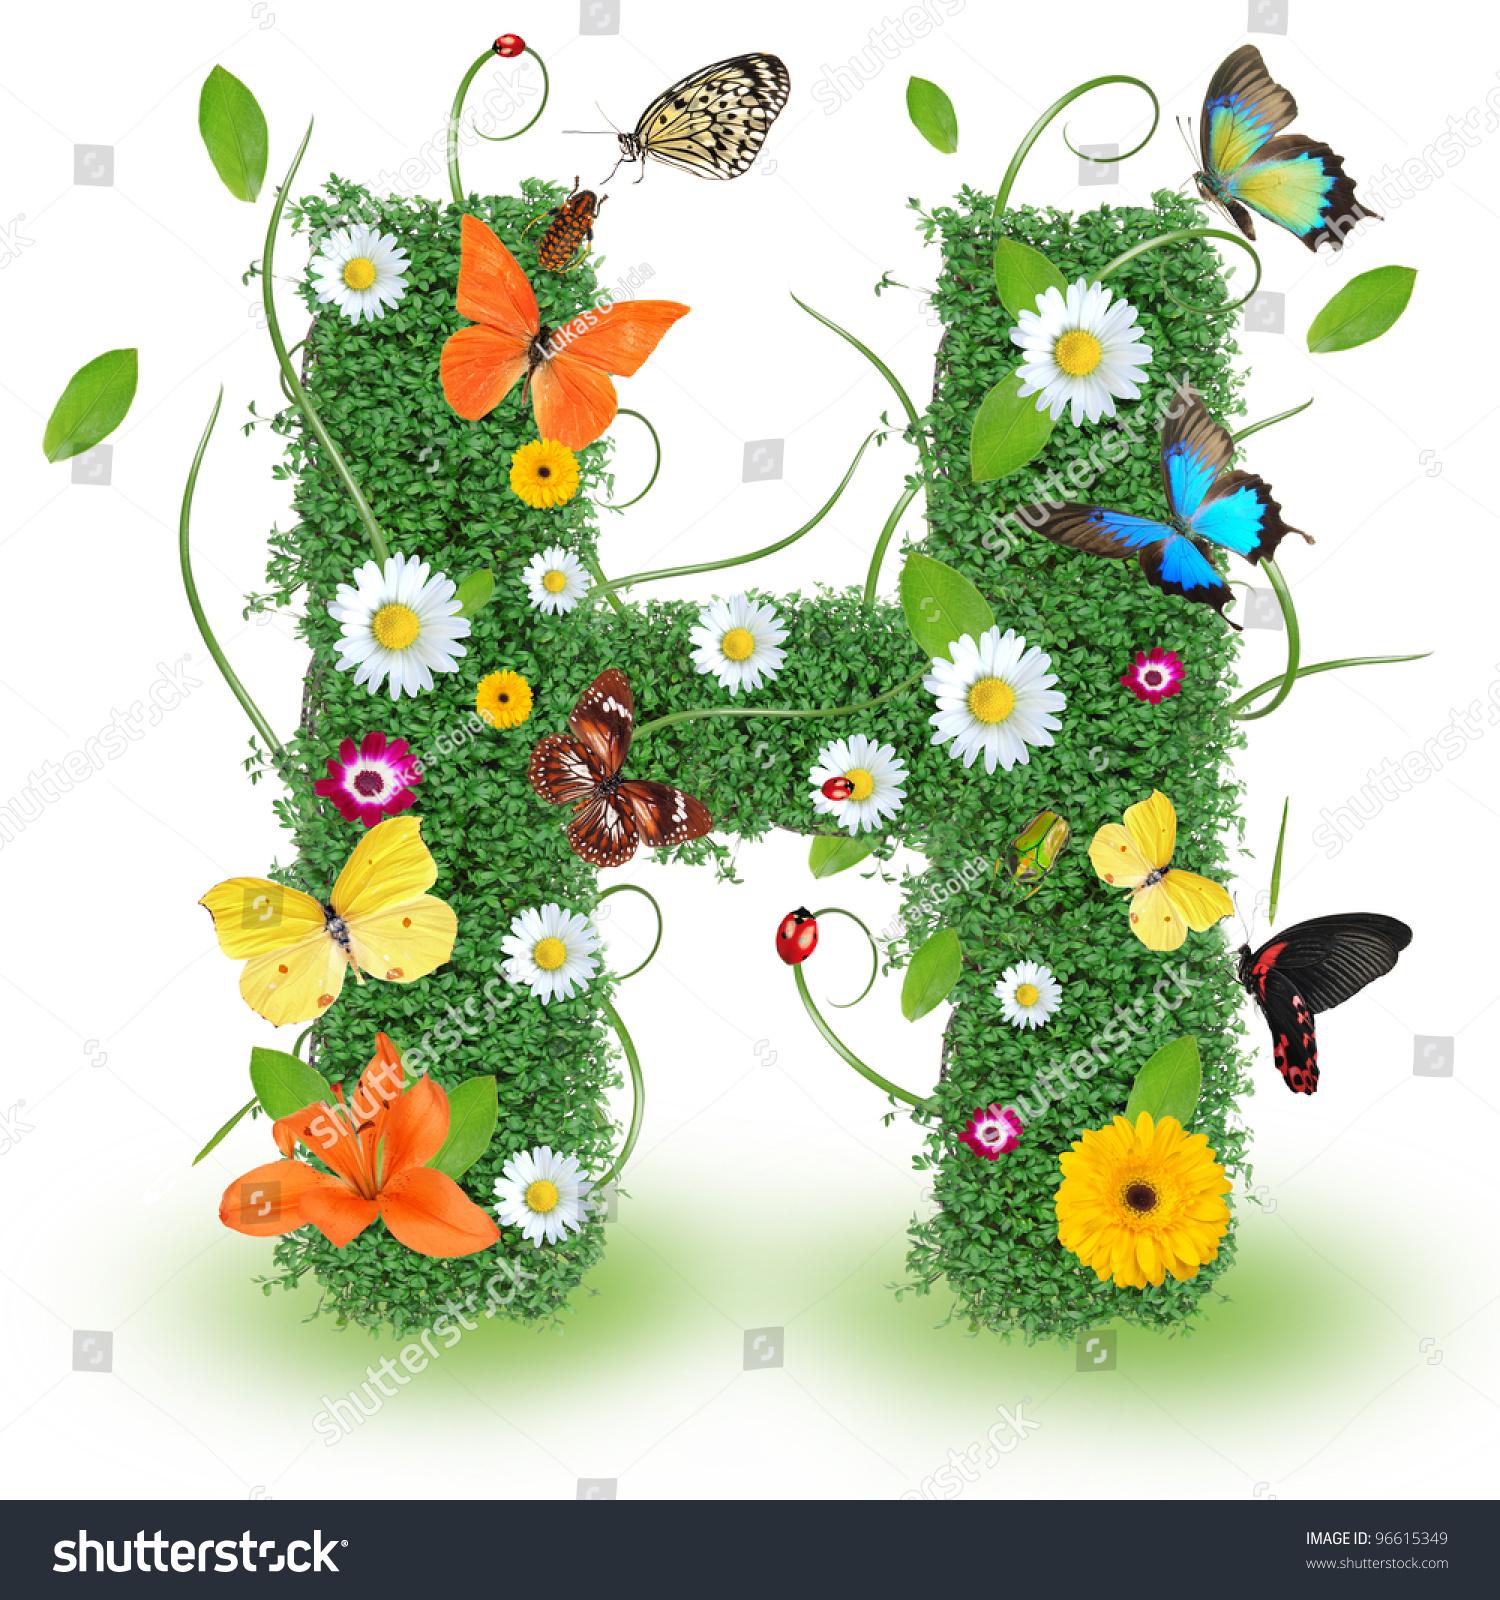 beautiful spring letter h stock photo 96615349 shutterstock. Black Bedroom Furniture Sets. Home Design Ideas